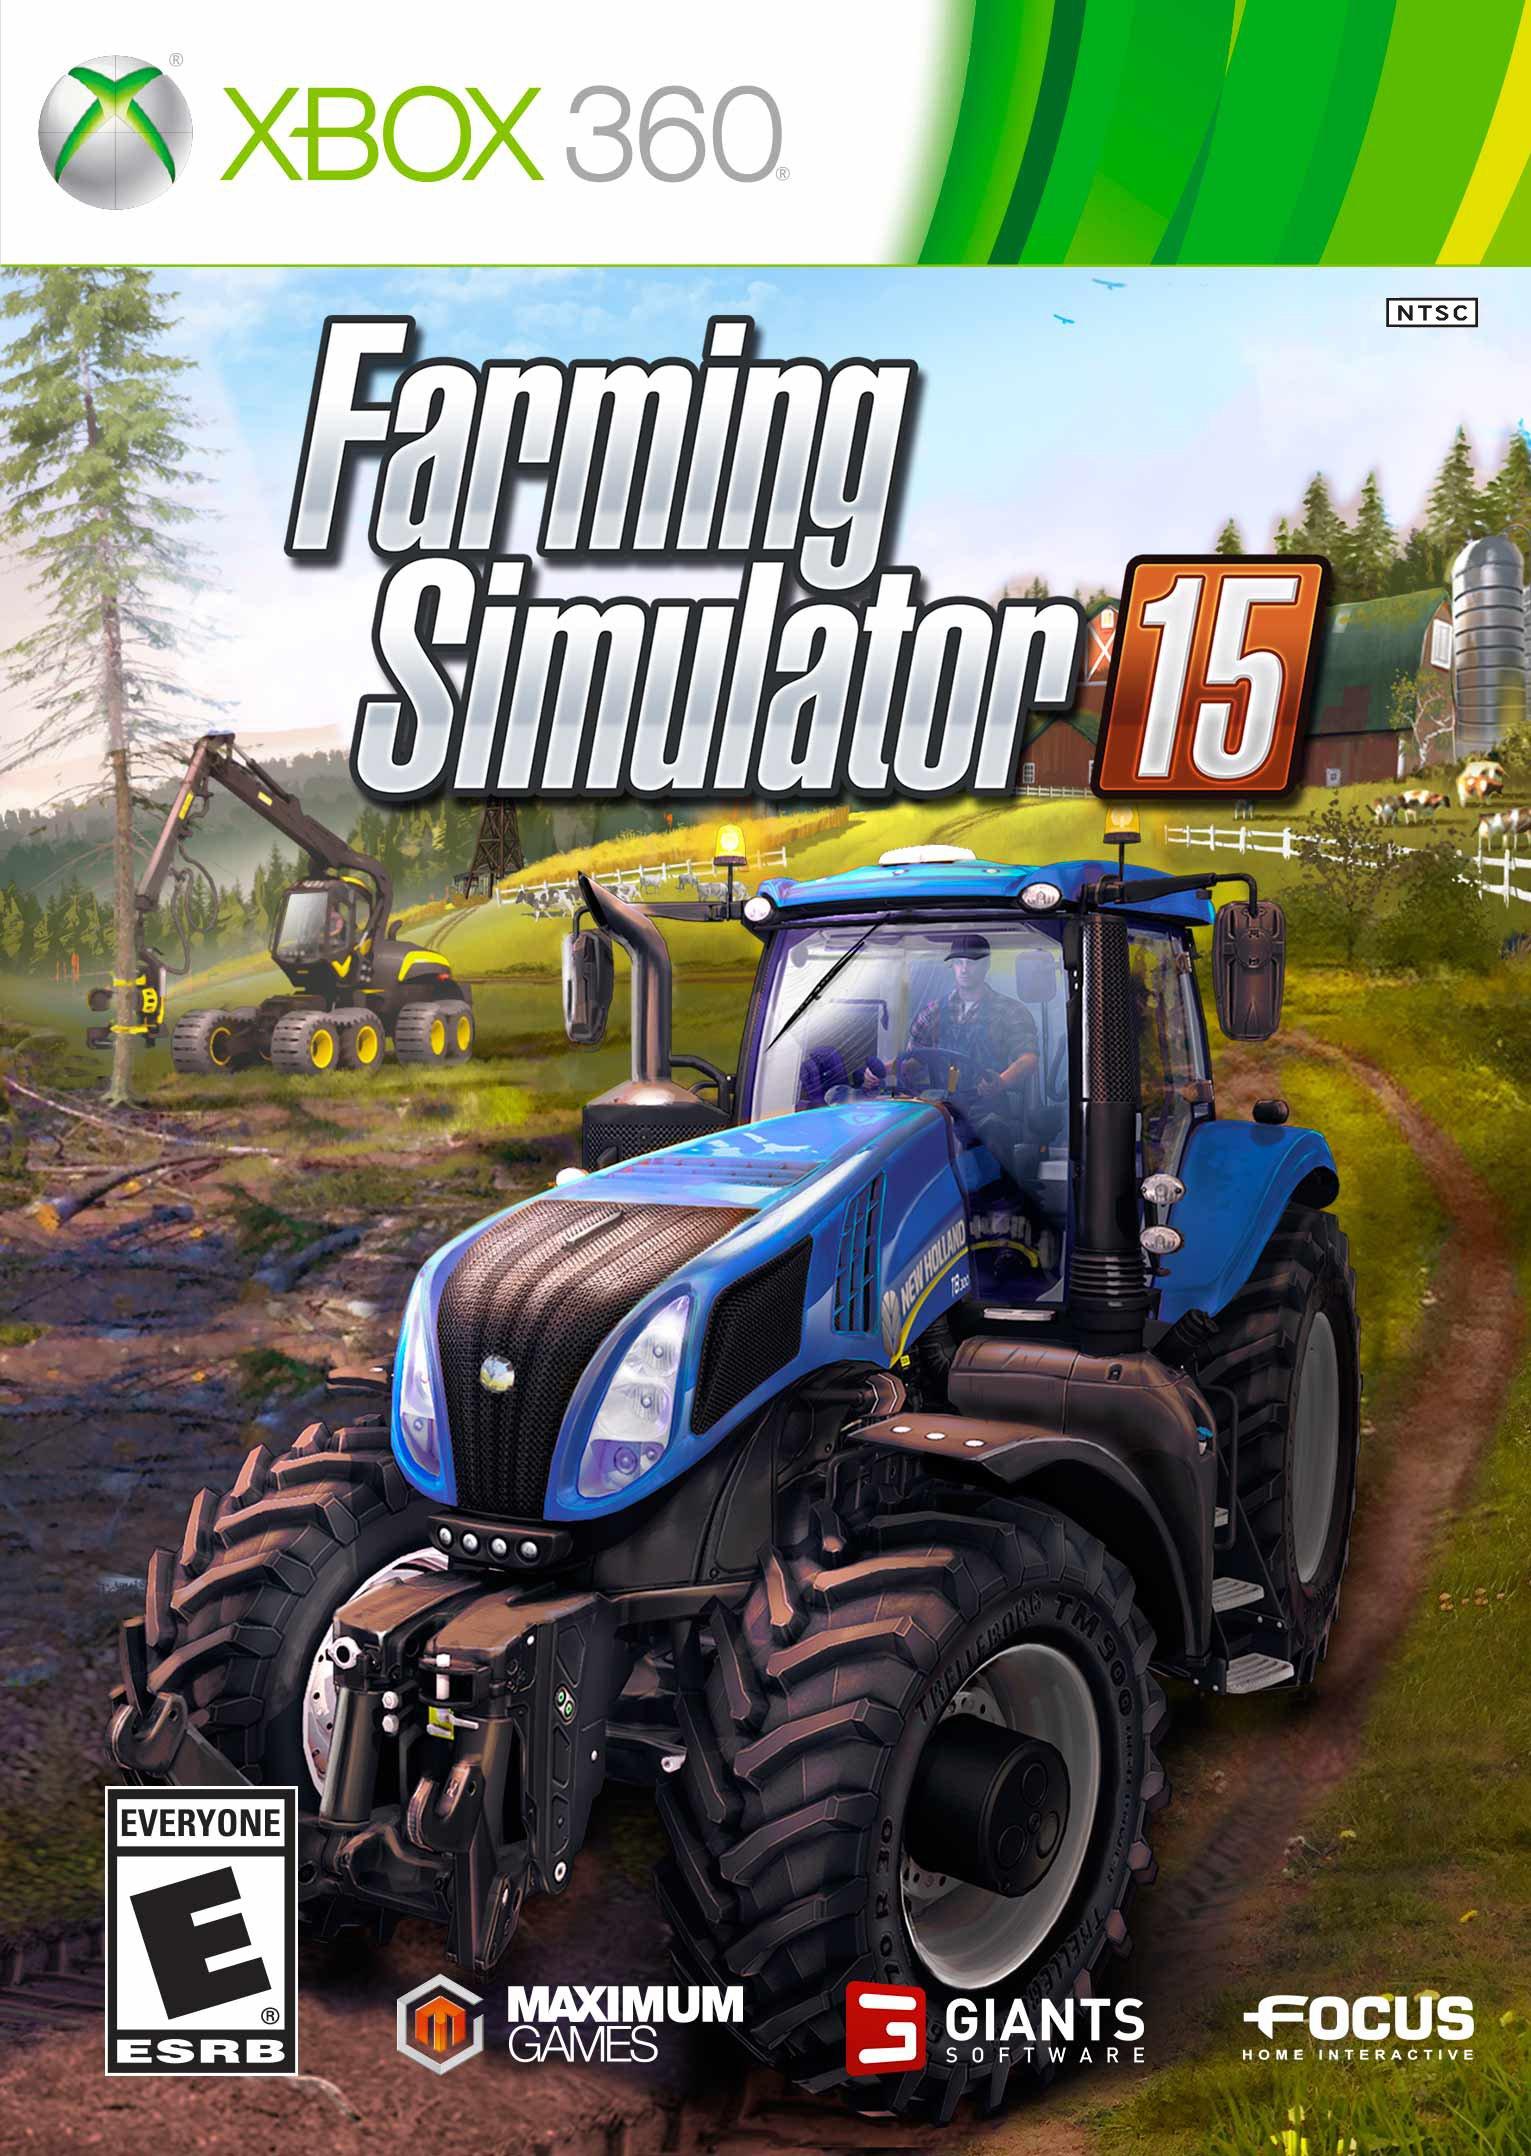 Farming Simulator 15 Release Date Xbox 360 PS3 Xbox One PS4